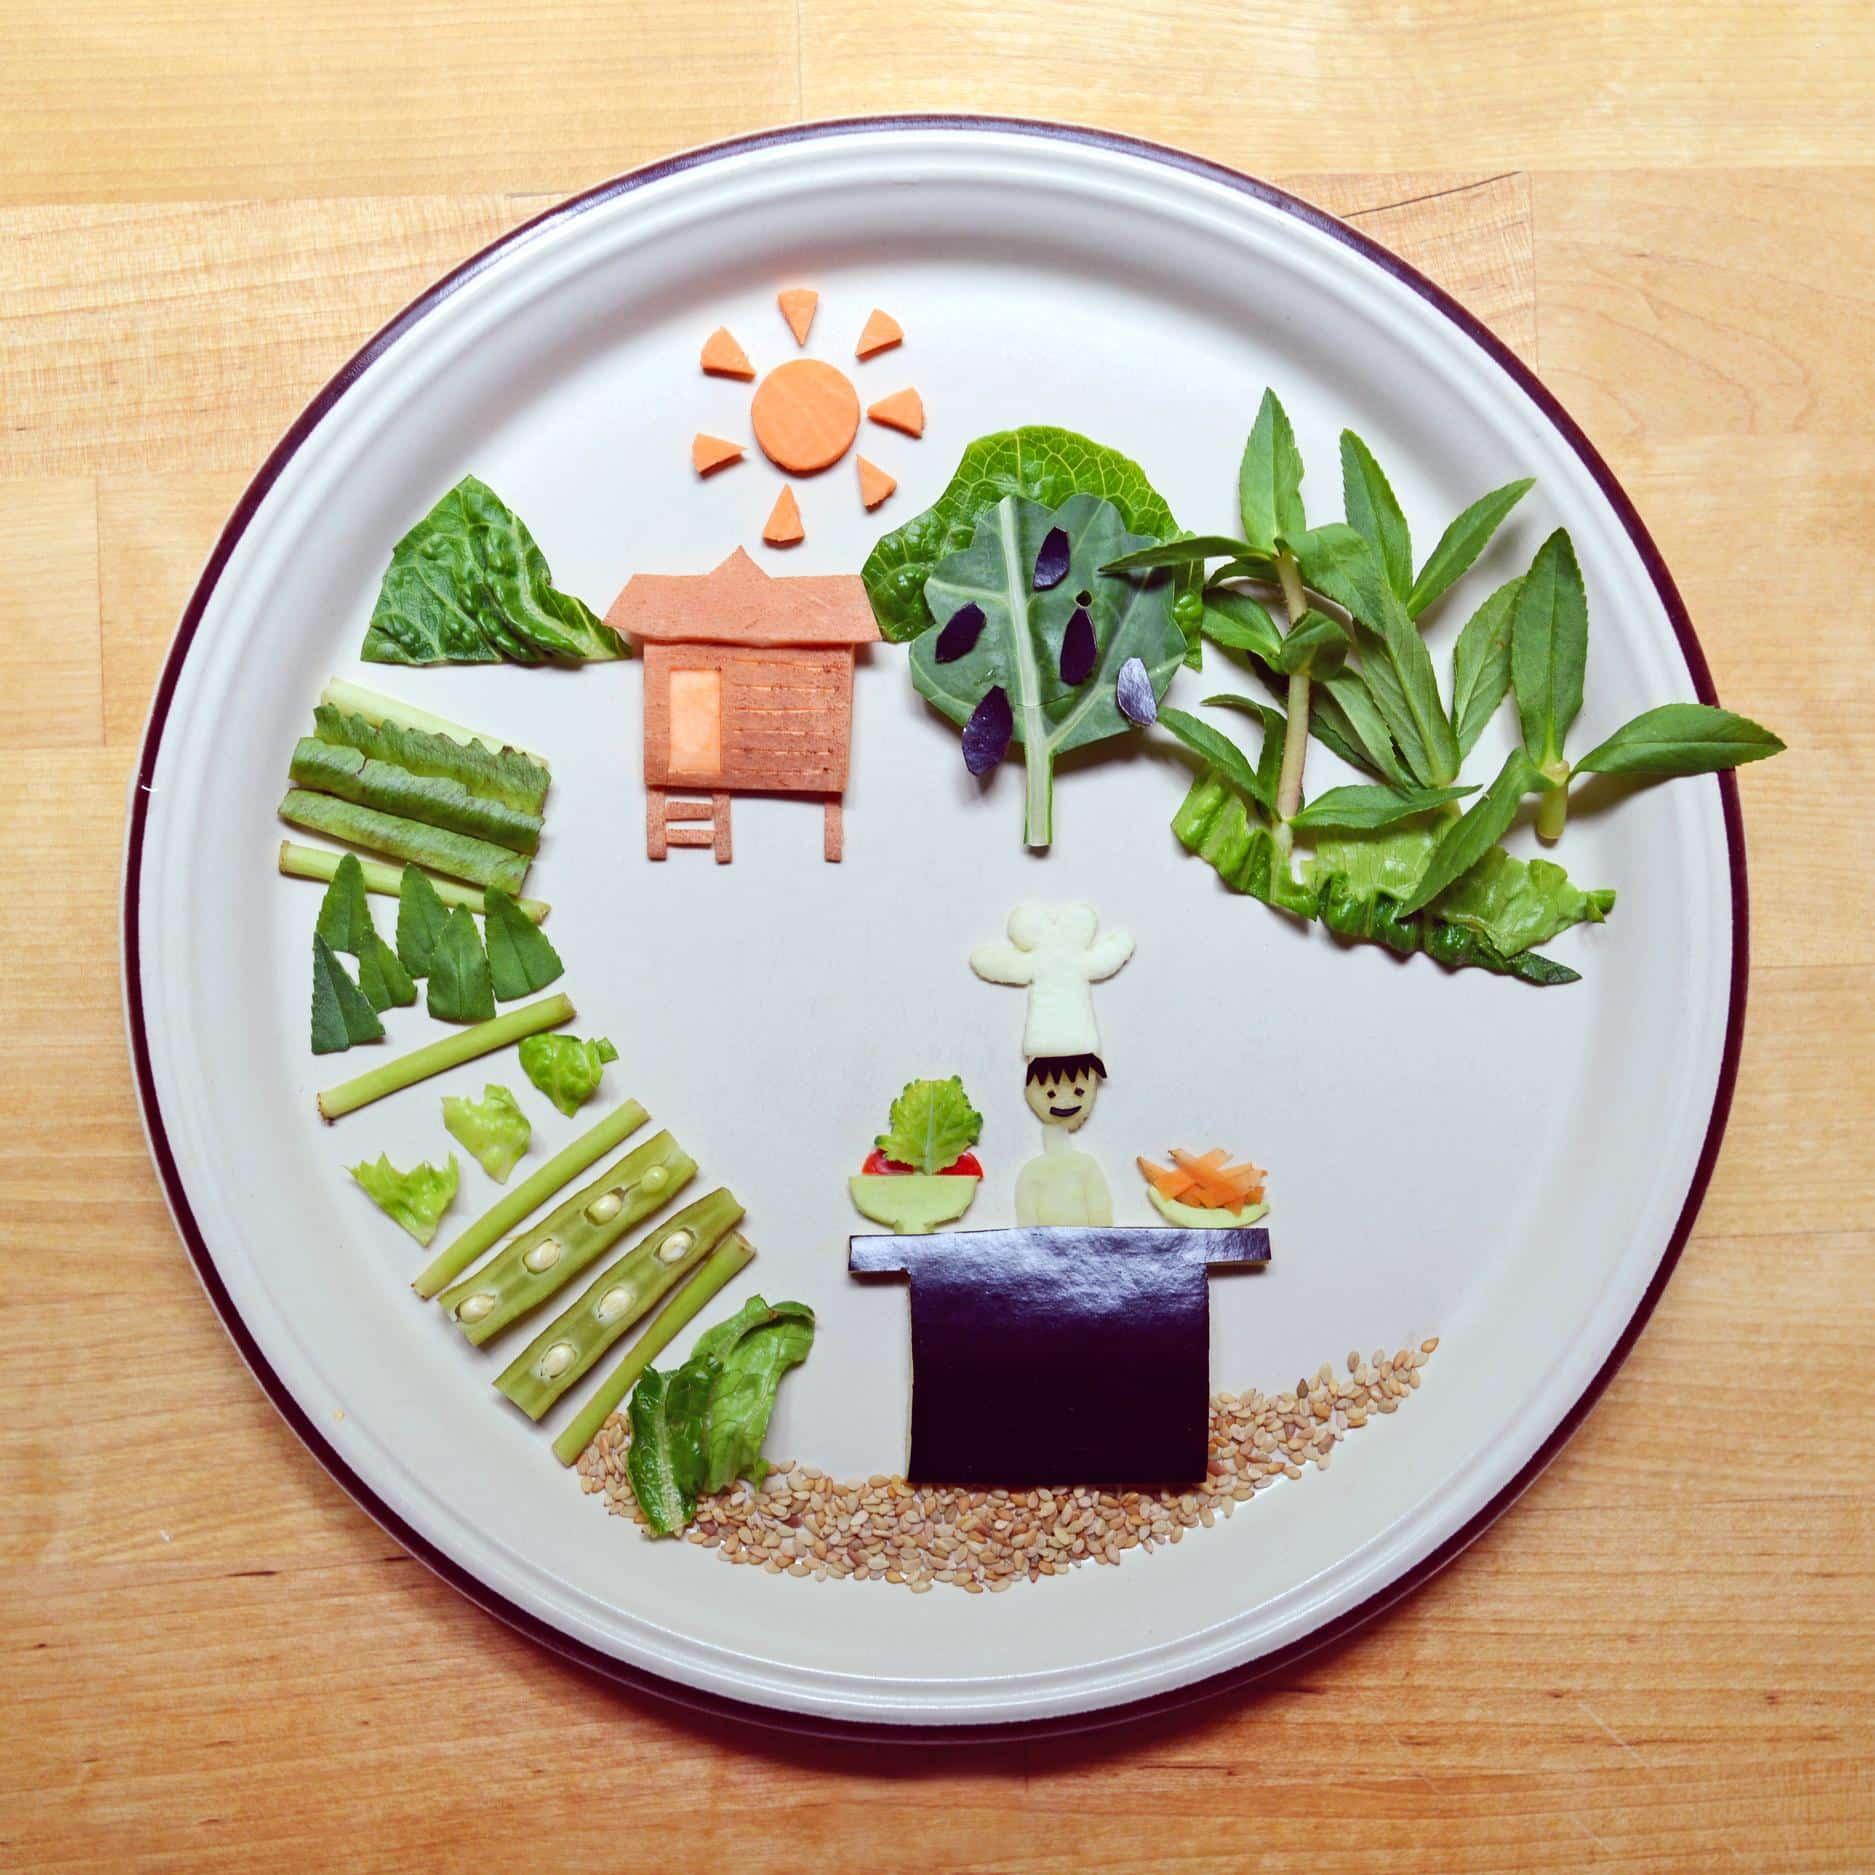 Food Art Work von Instagram food artist and enthusiast Ida Skivenes (IdaFrosk)